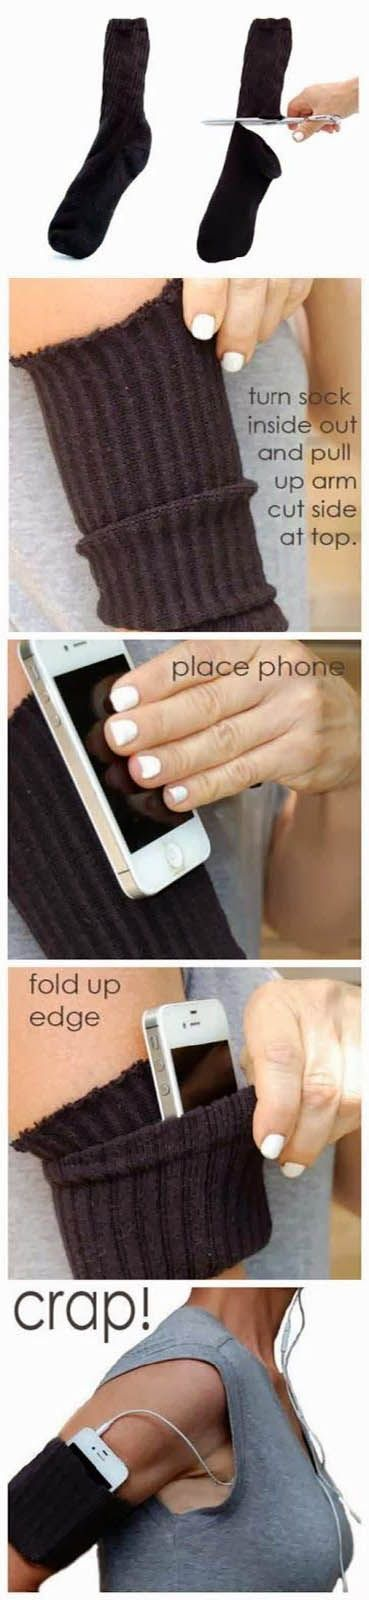 Easy Iphone Carrier | DIY & Crafts Tutorials